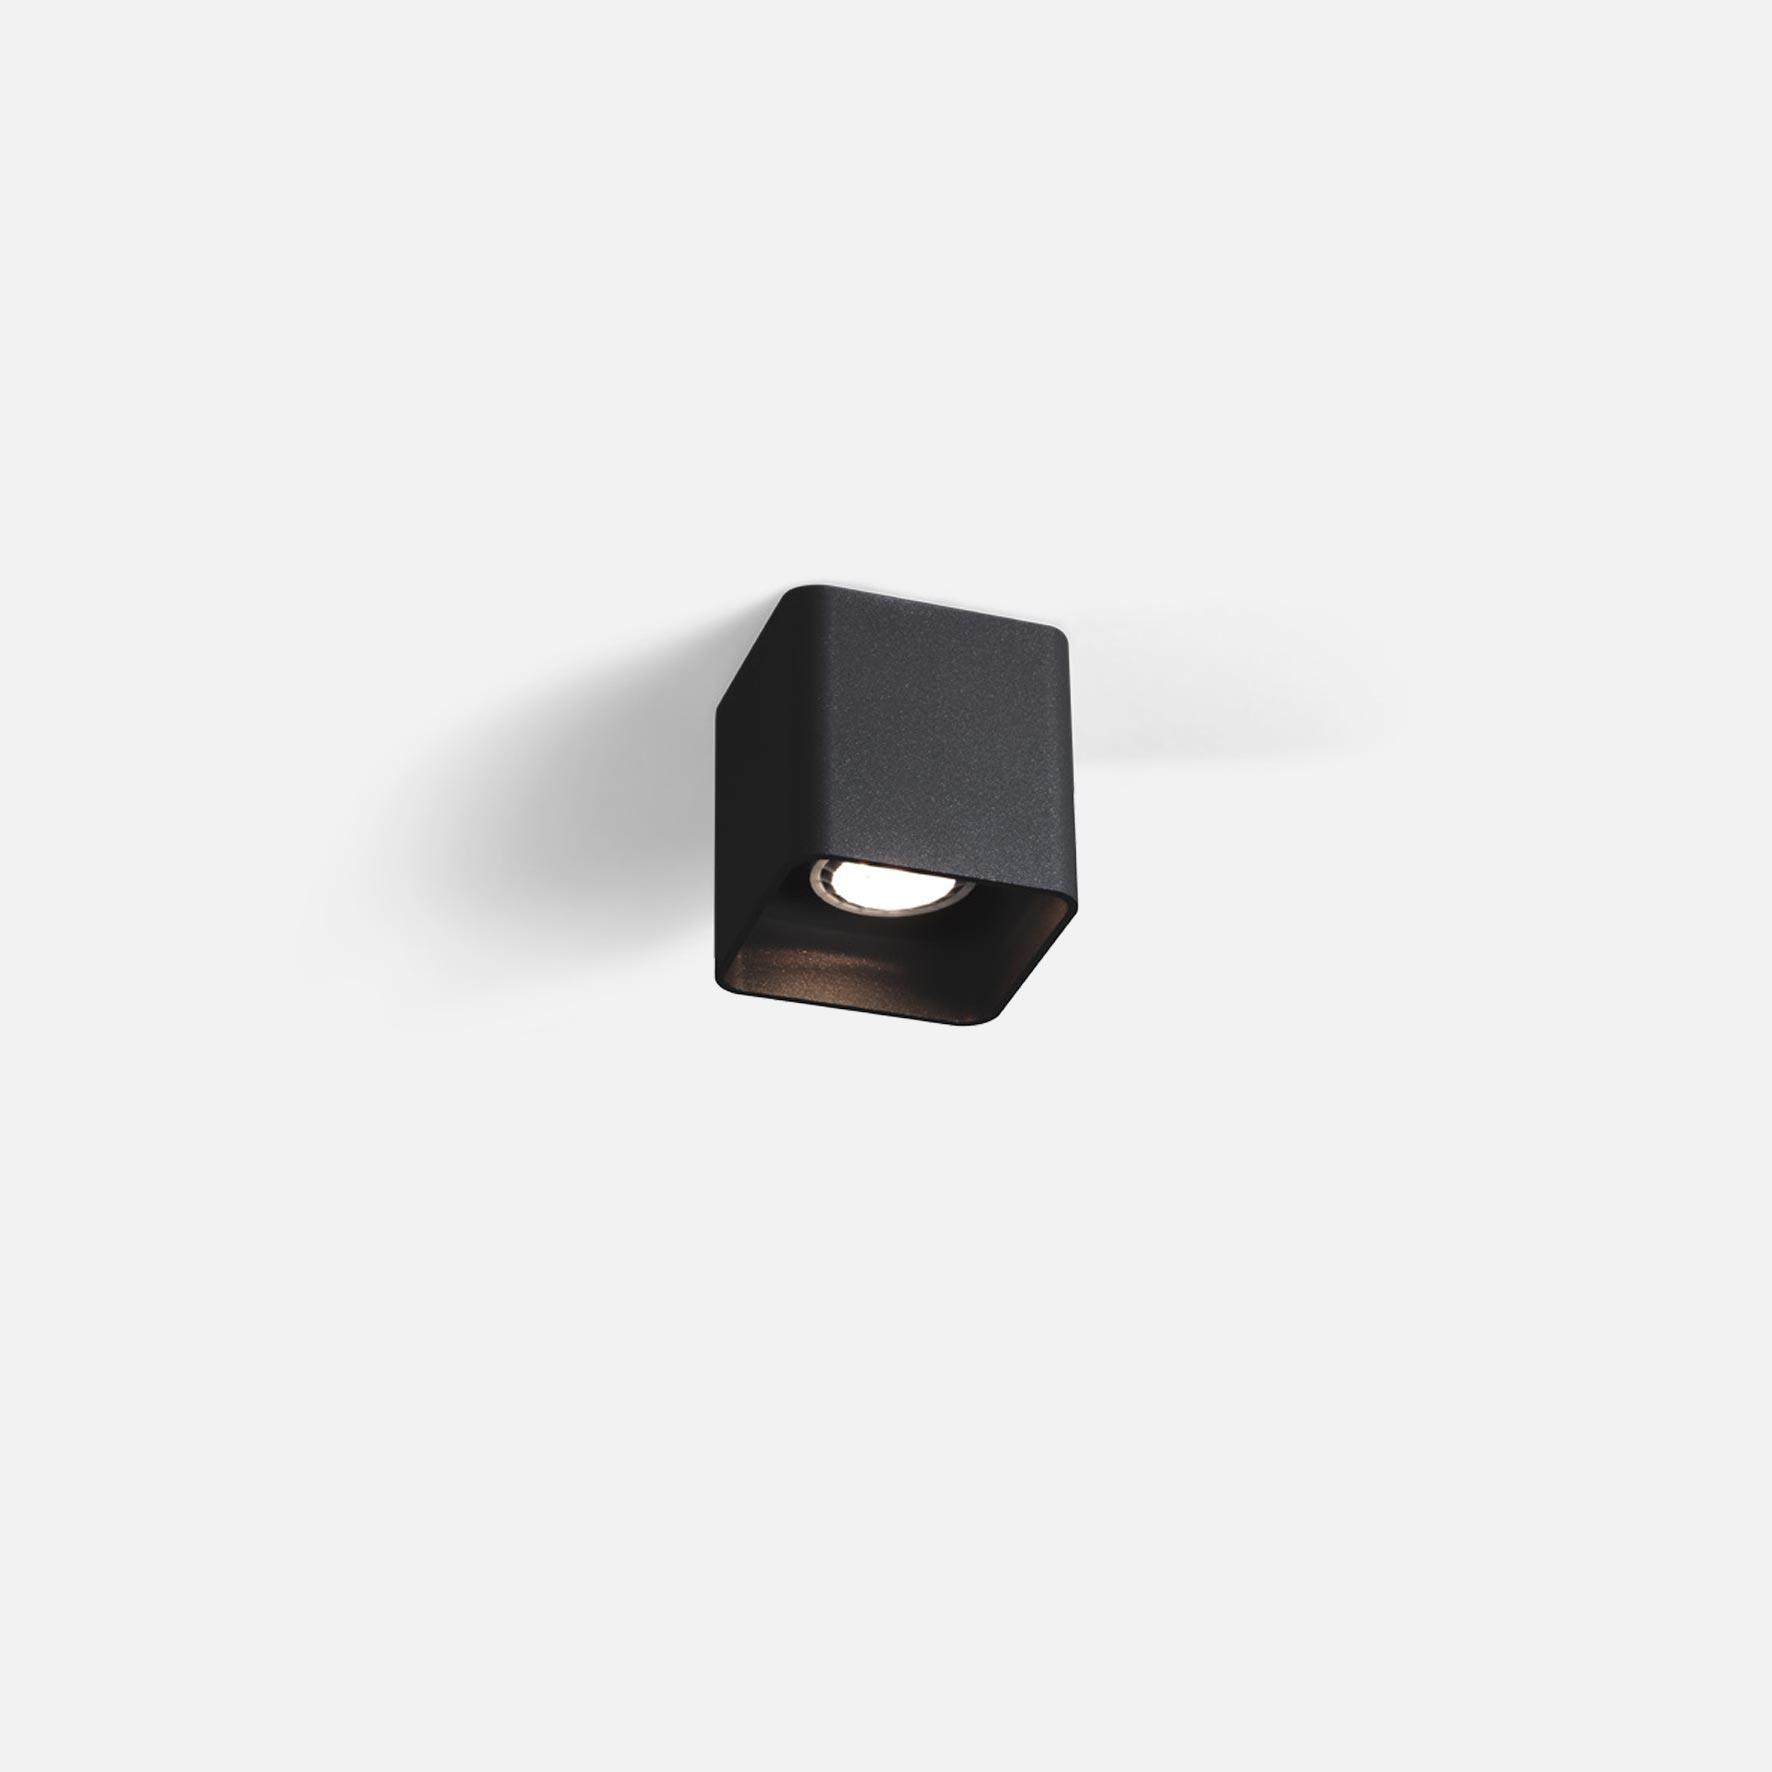 Docus 1.0 led black texture 3000k